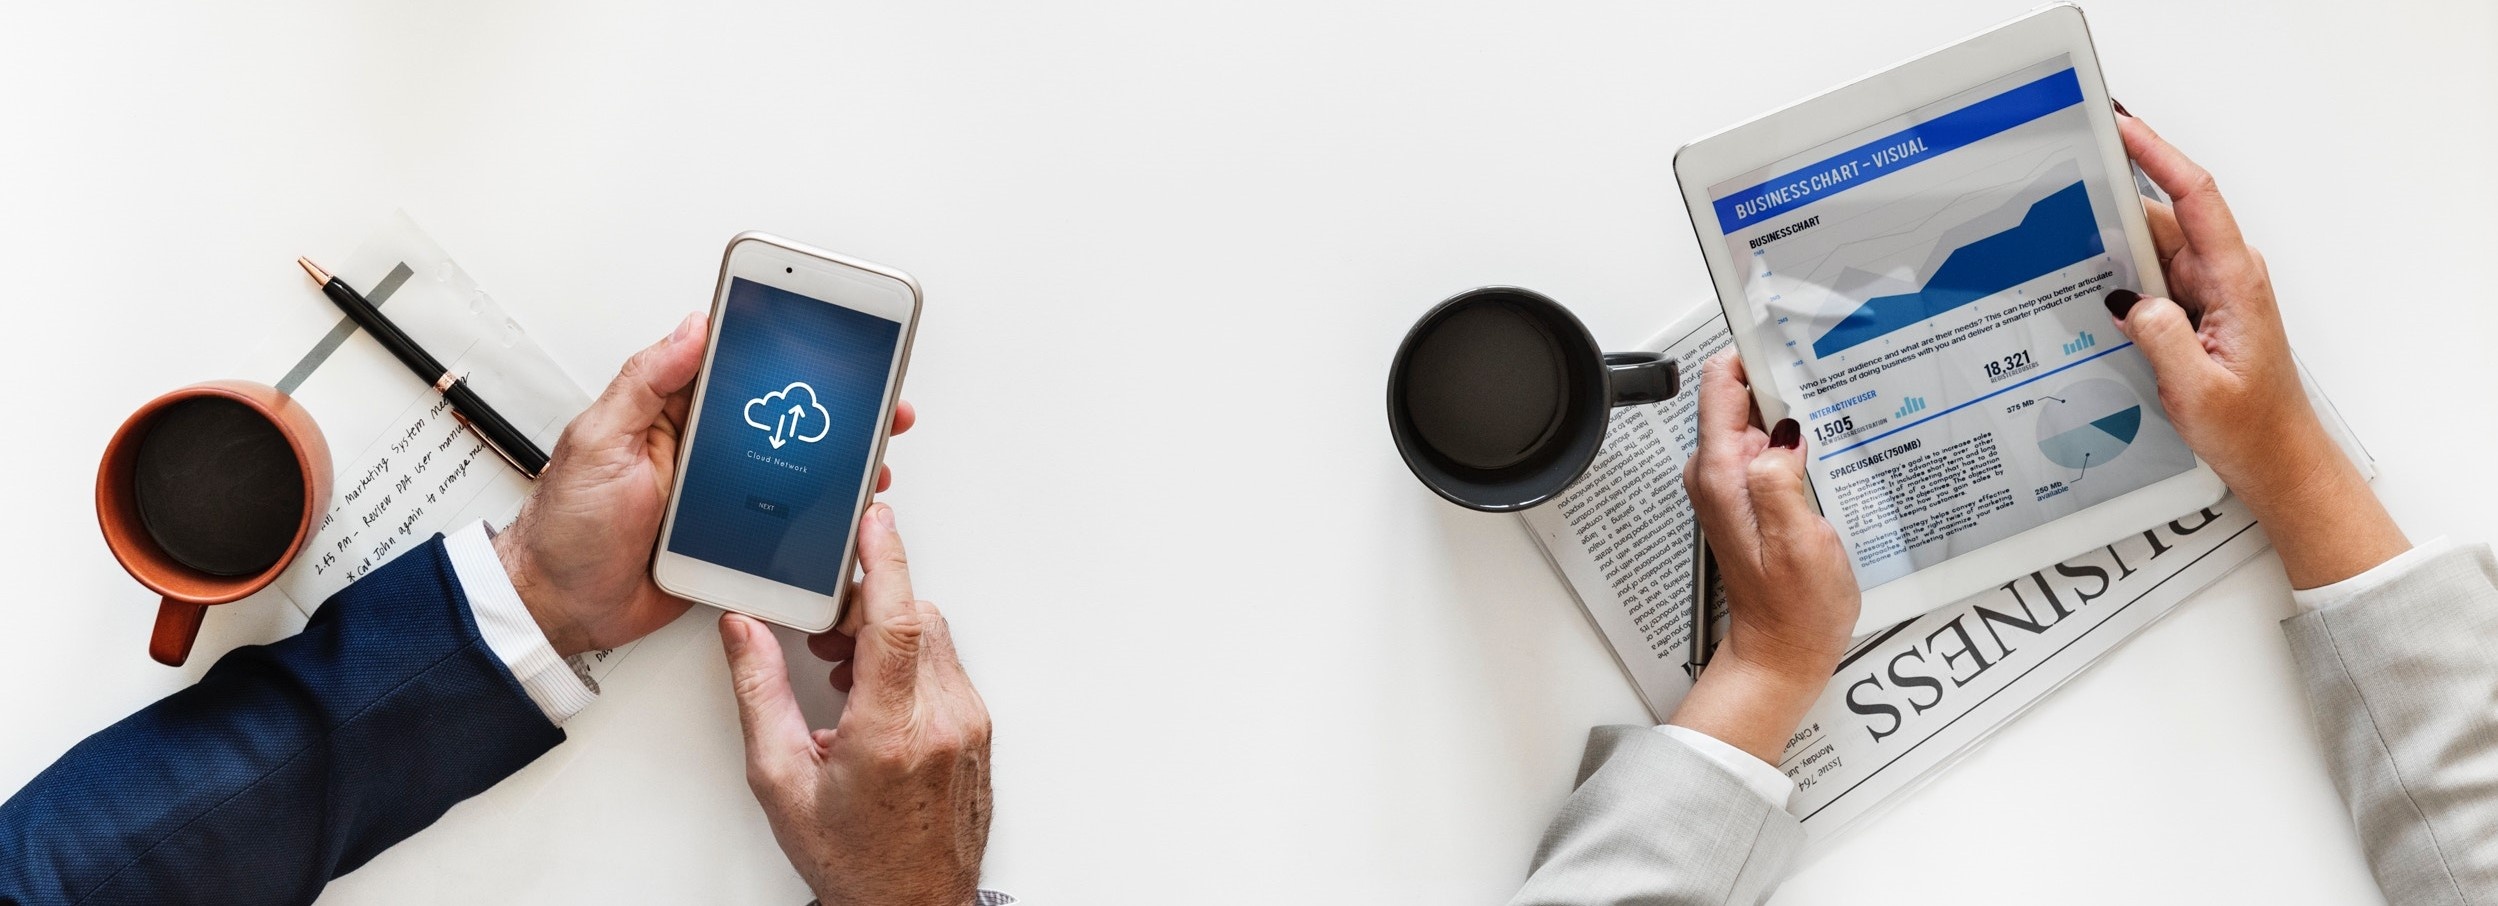 DBA In Strategic Media And Digital Content Online Degree